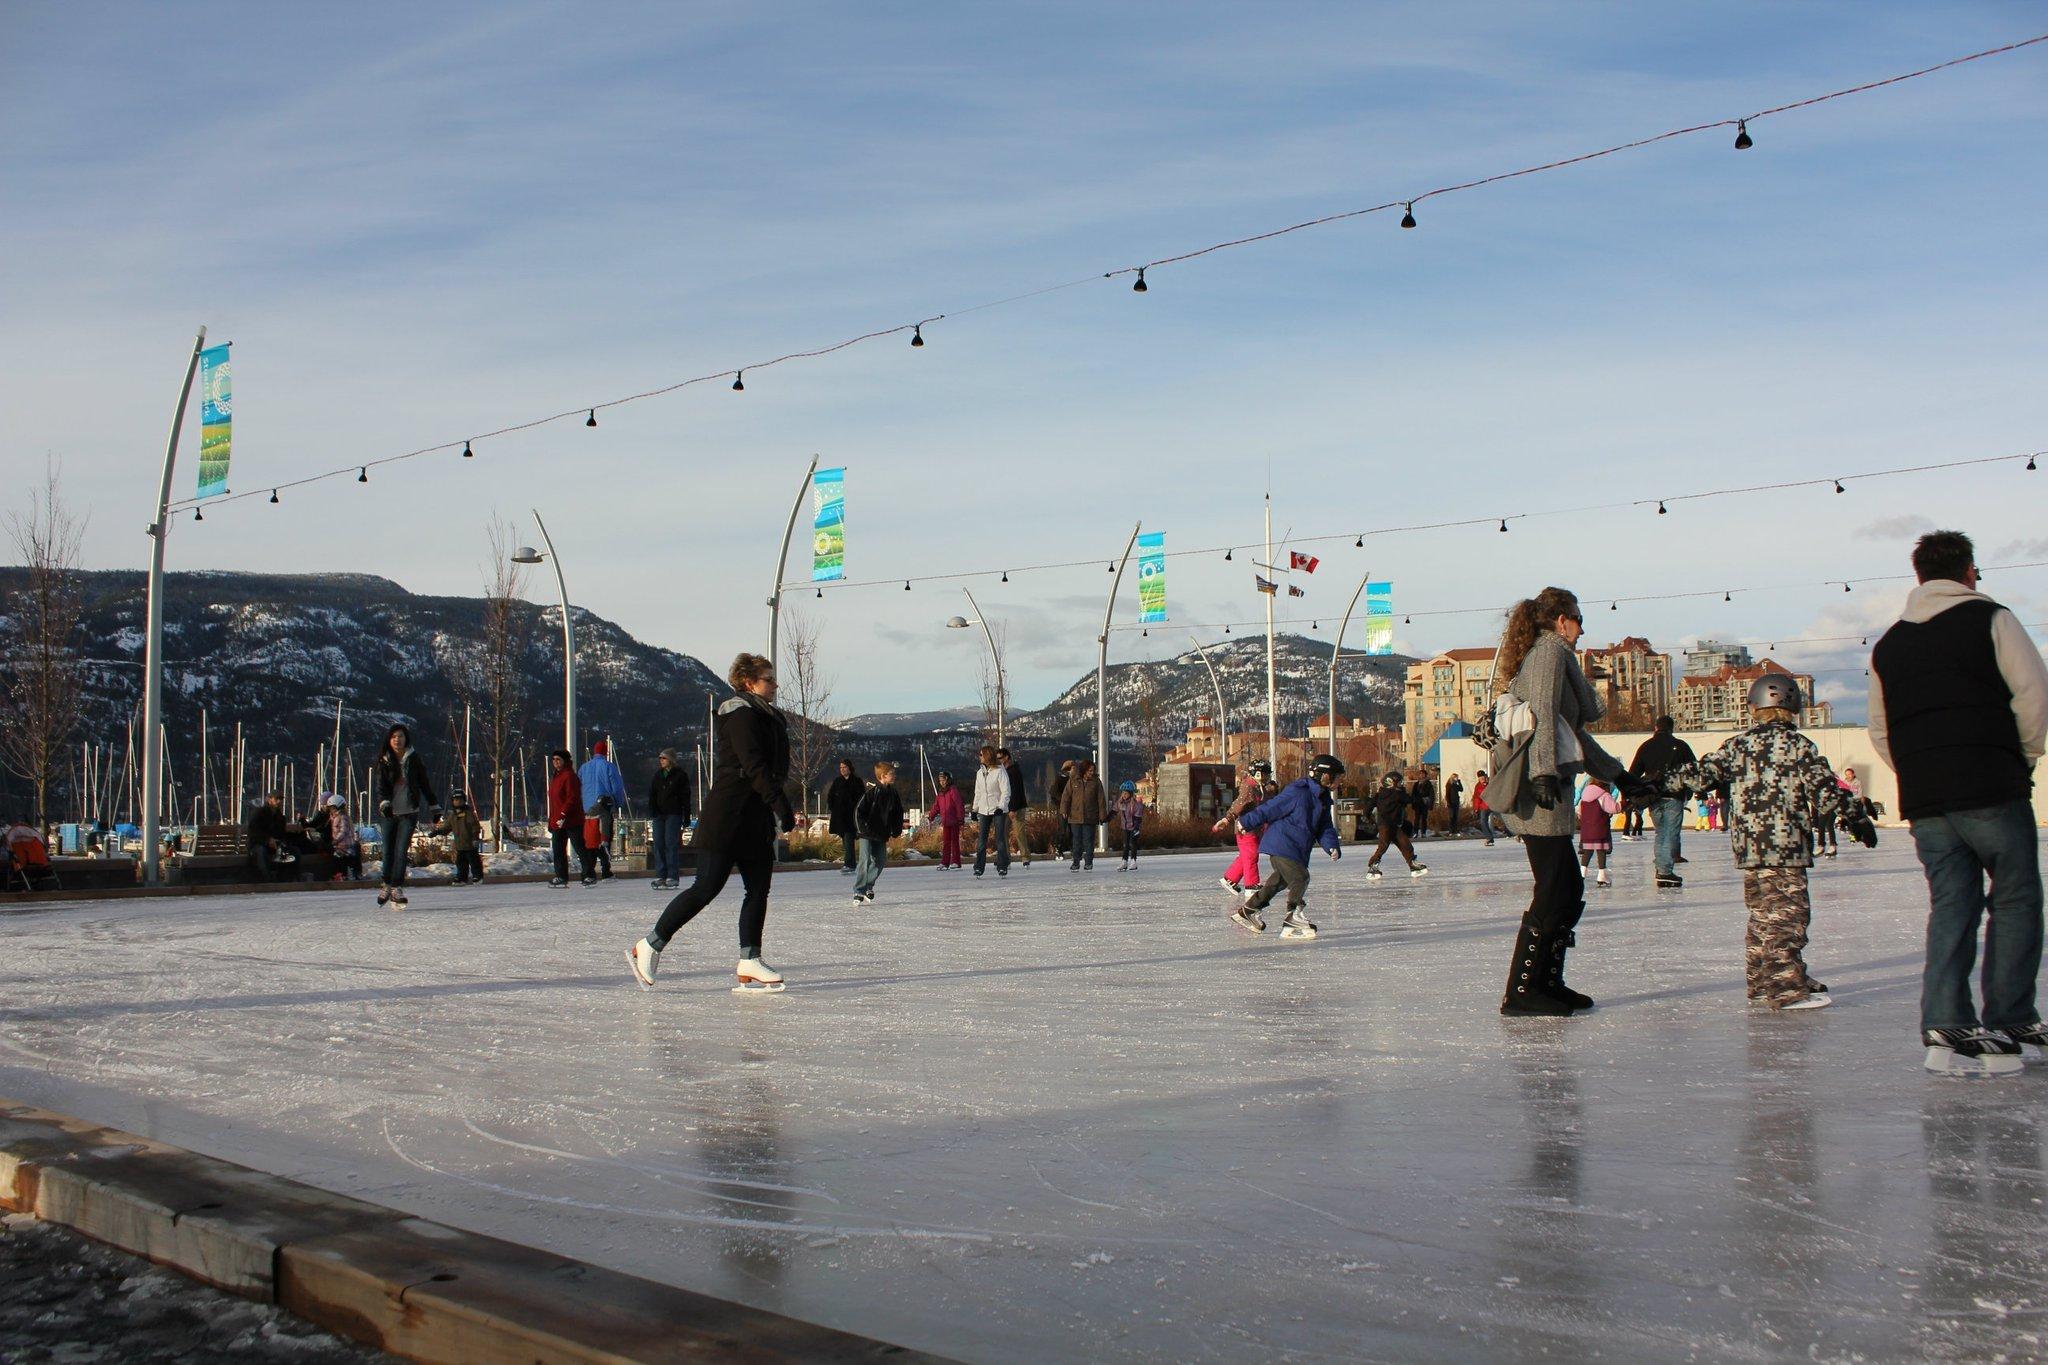 Biggest Backyard Ice Rink : charlene rink wikipedia the free encyclopedia charlene rink born